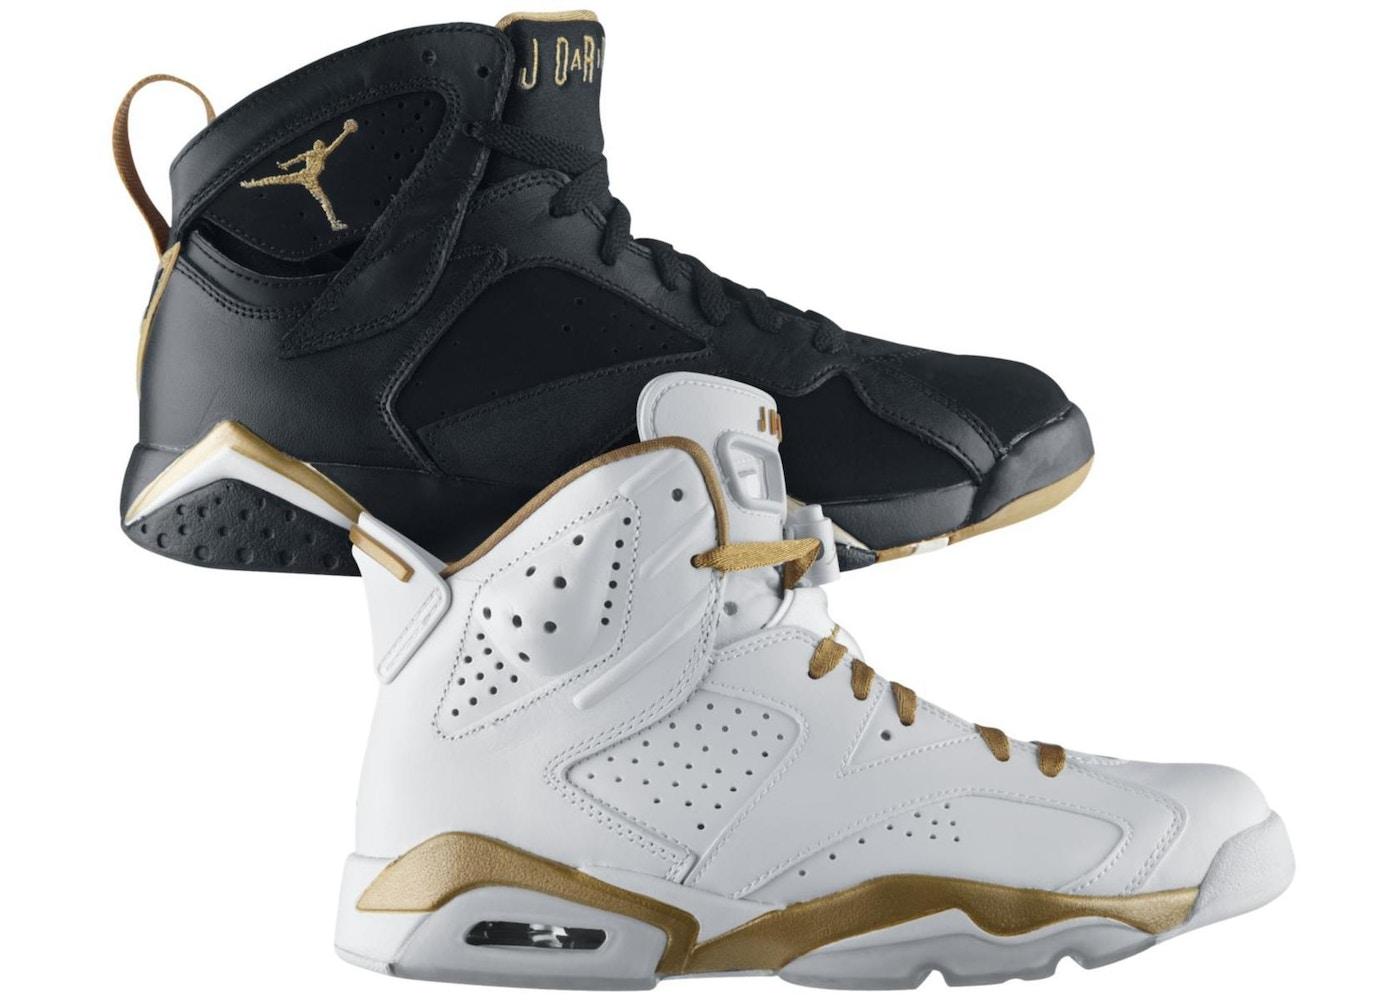 online store 25d40 f03c1 ... 6 7 Retro  Jordan Golden Moments Pack (67) ...